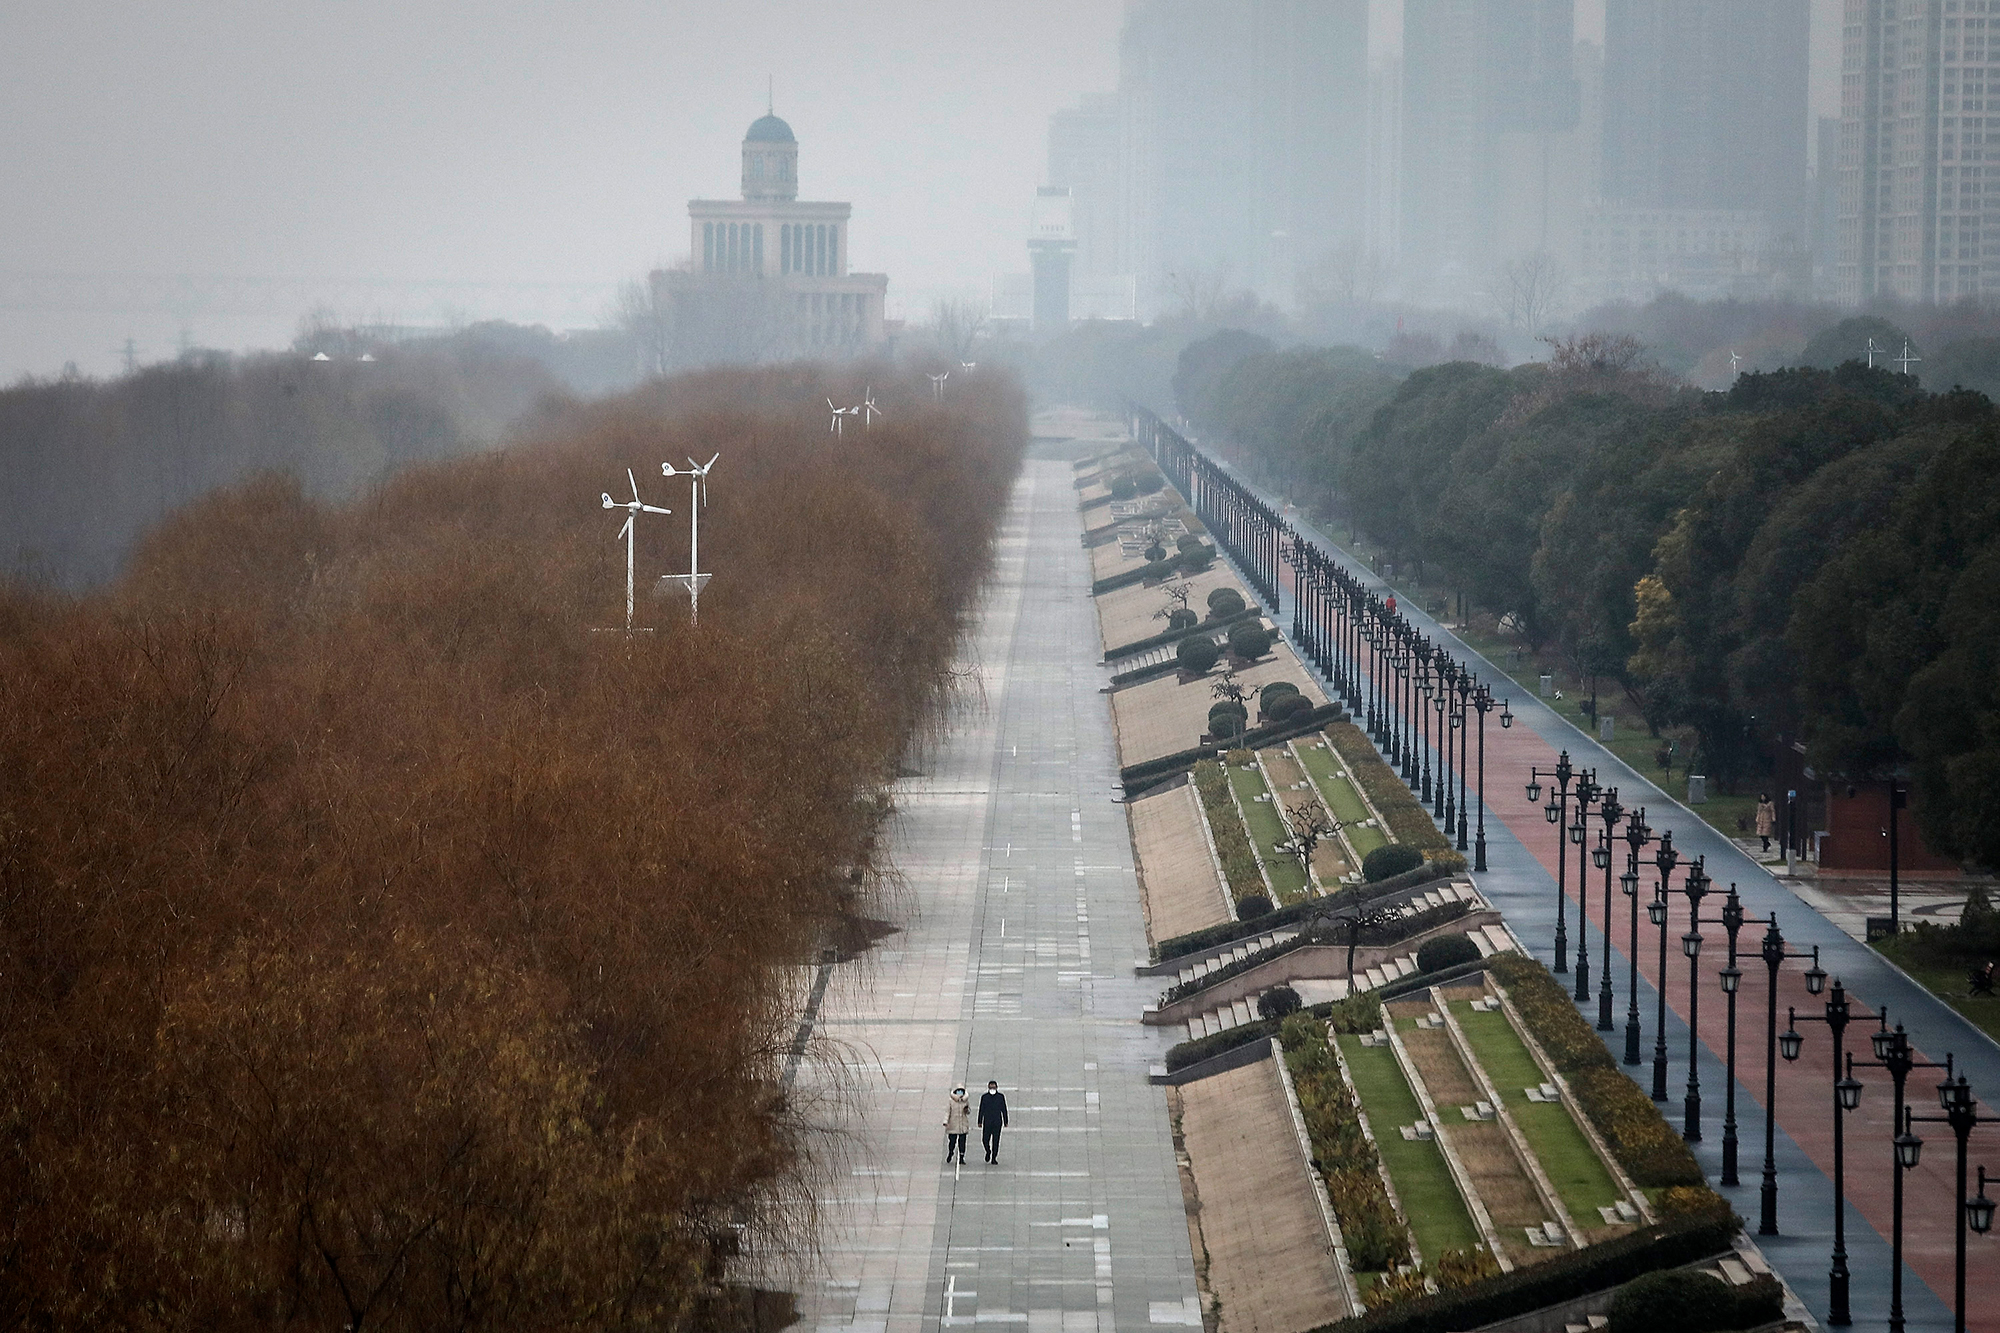 US State Department charter flight to depart China amid coronavirus outbreak